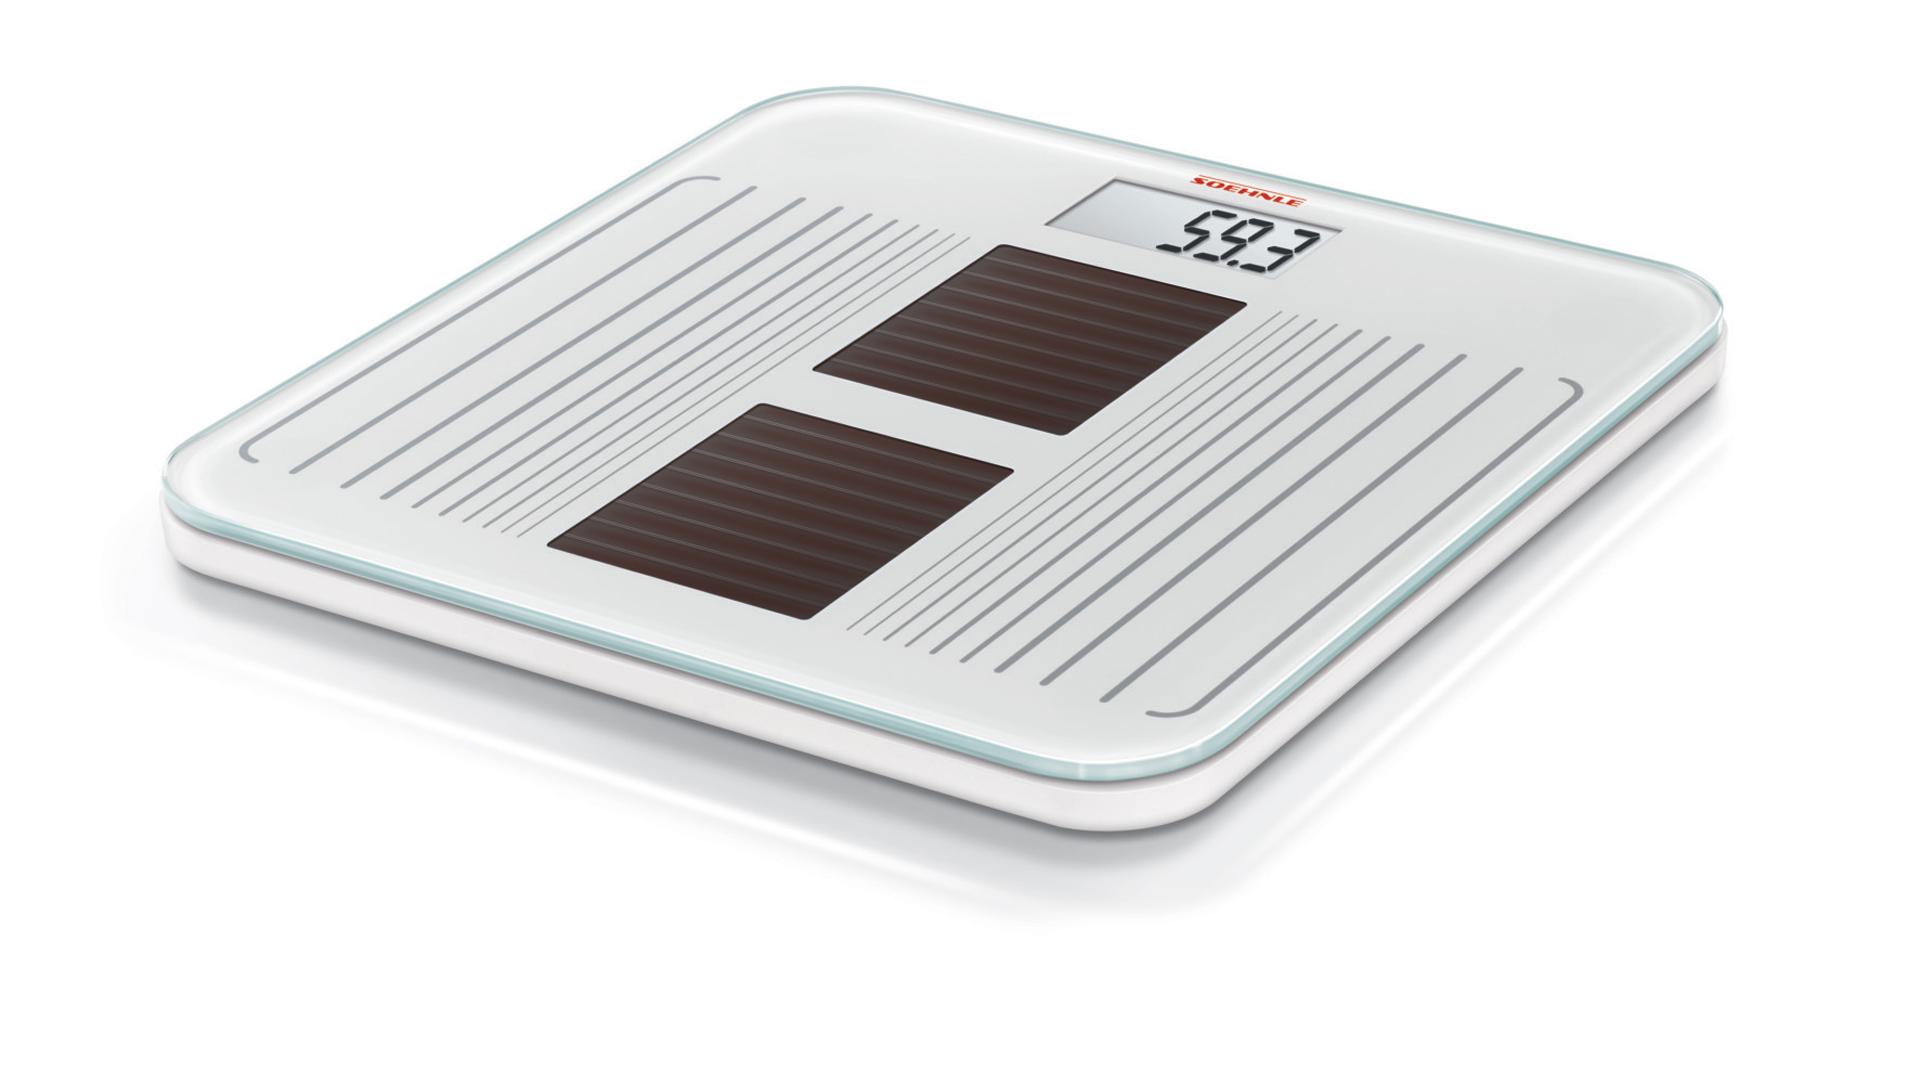 Best accurate bathroom scales - Best Accurate Bathroom Scales 41